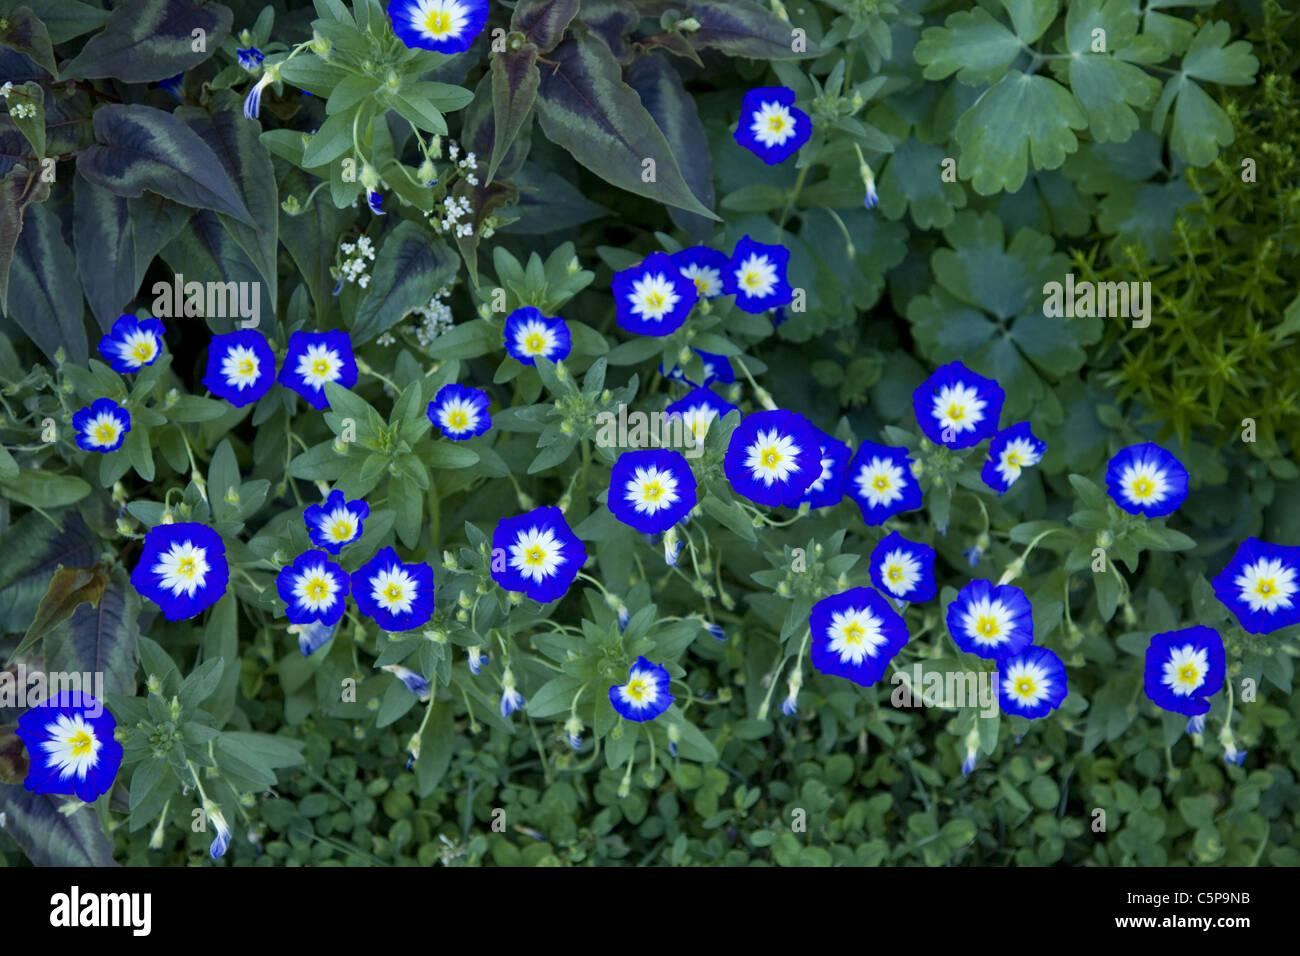 Morning Glories, Brooklyn Botanic Garden, Brooklyn, NY. - Stock Image